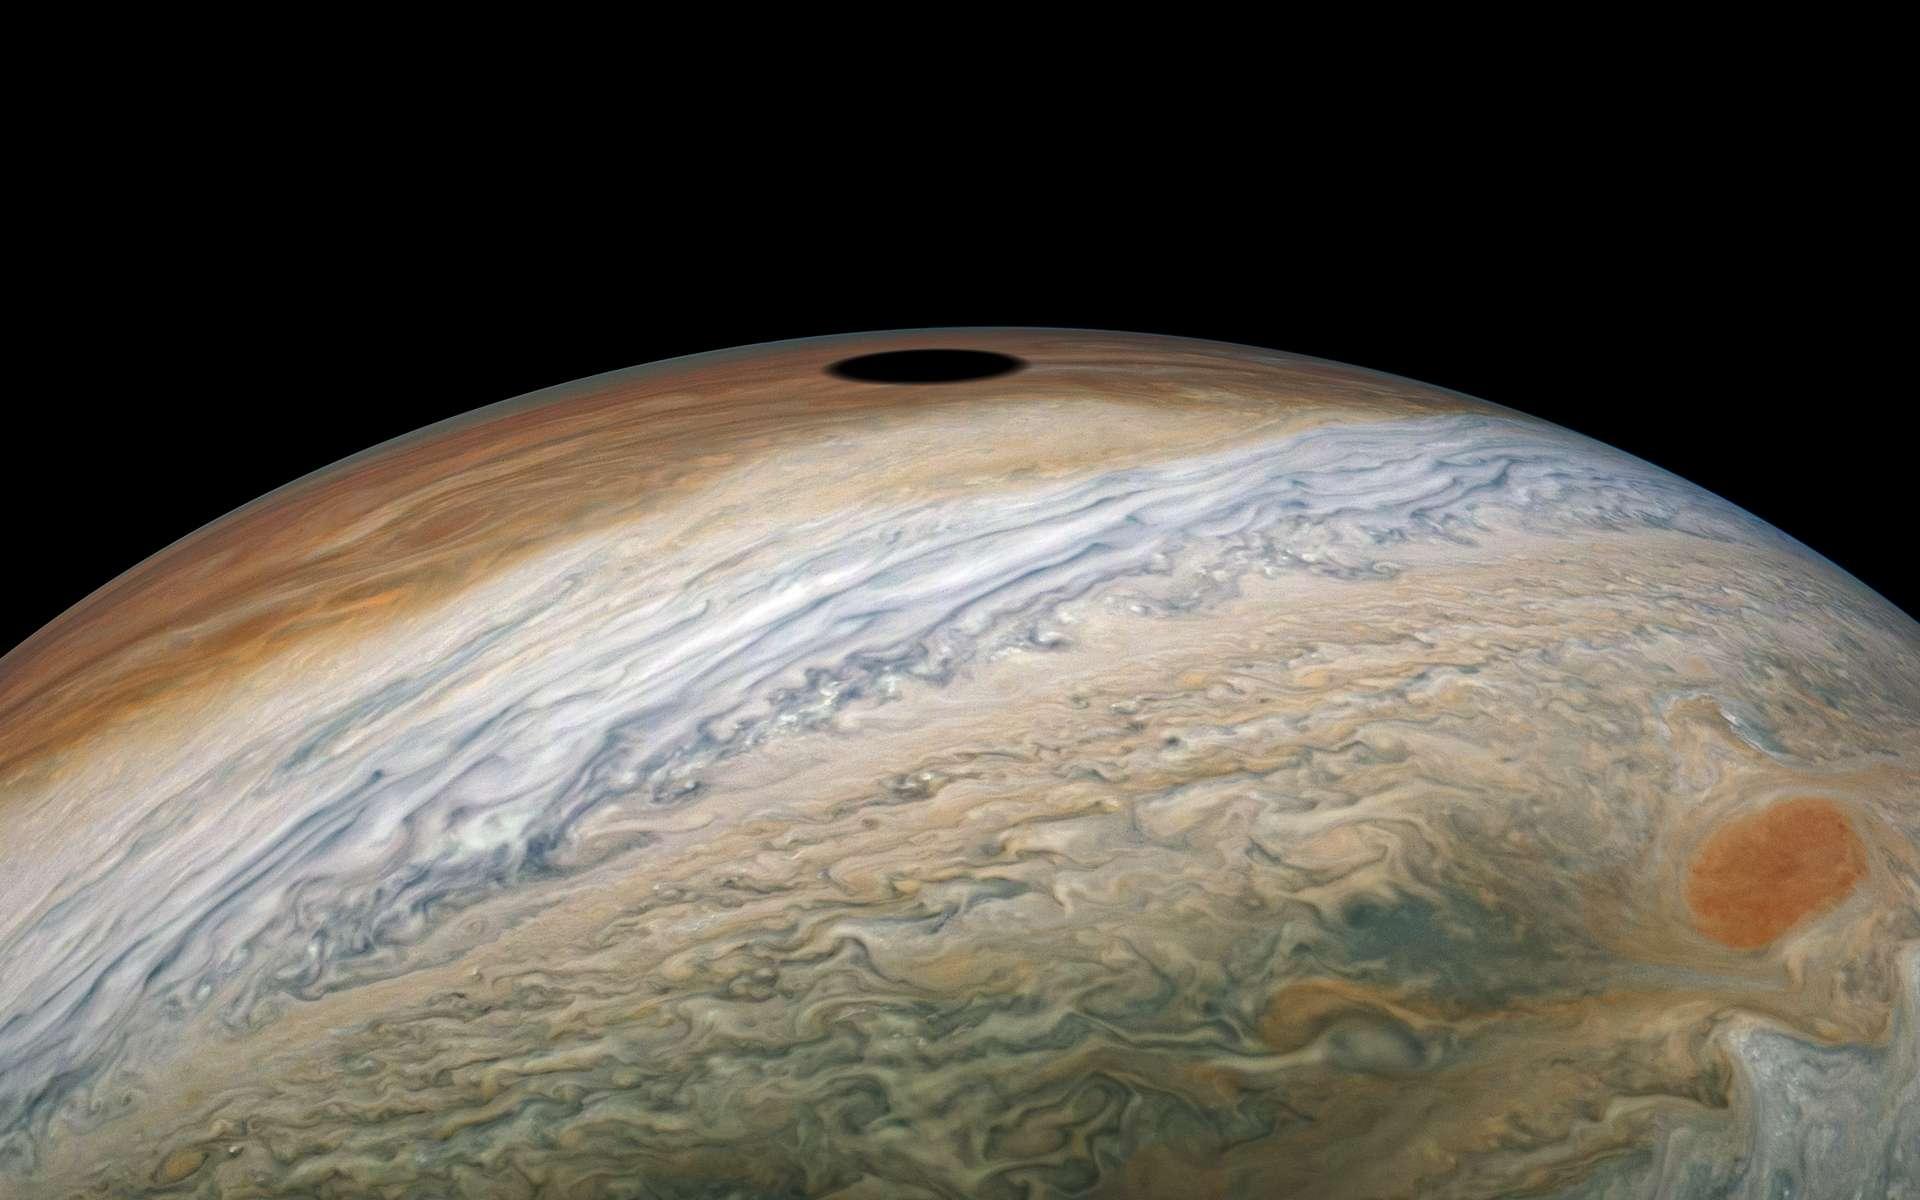 https://www.futura-sciences.com/sciences/breves/jupiter-magnifique-eclipse-soleil-jupiter-epiee-juno-1197/#xtor=RSS-8